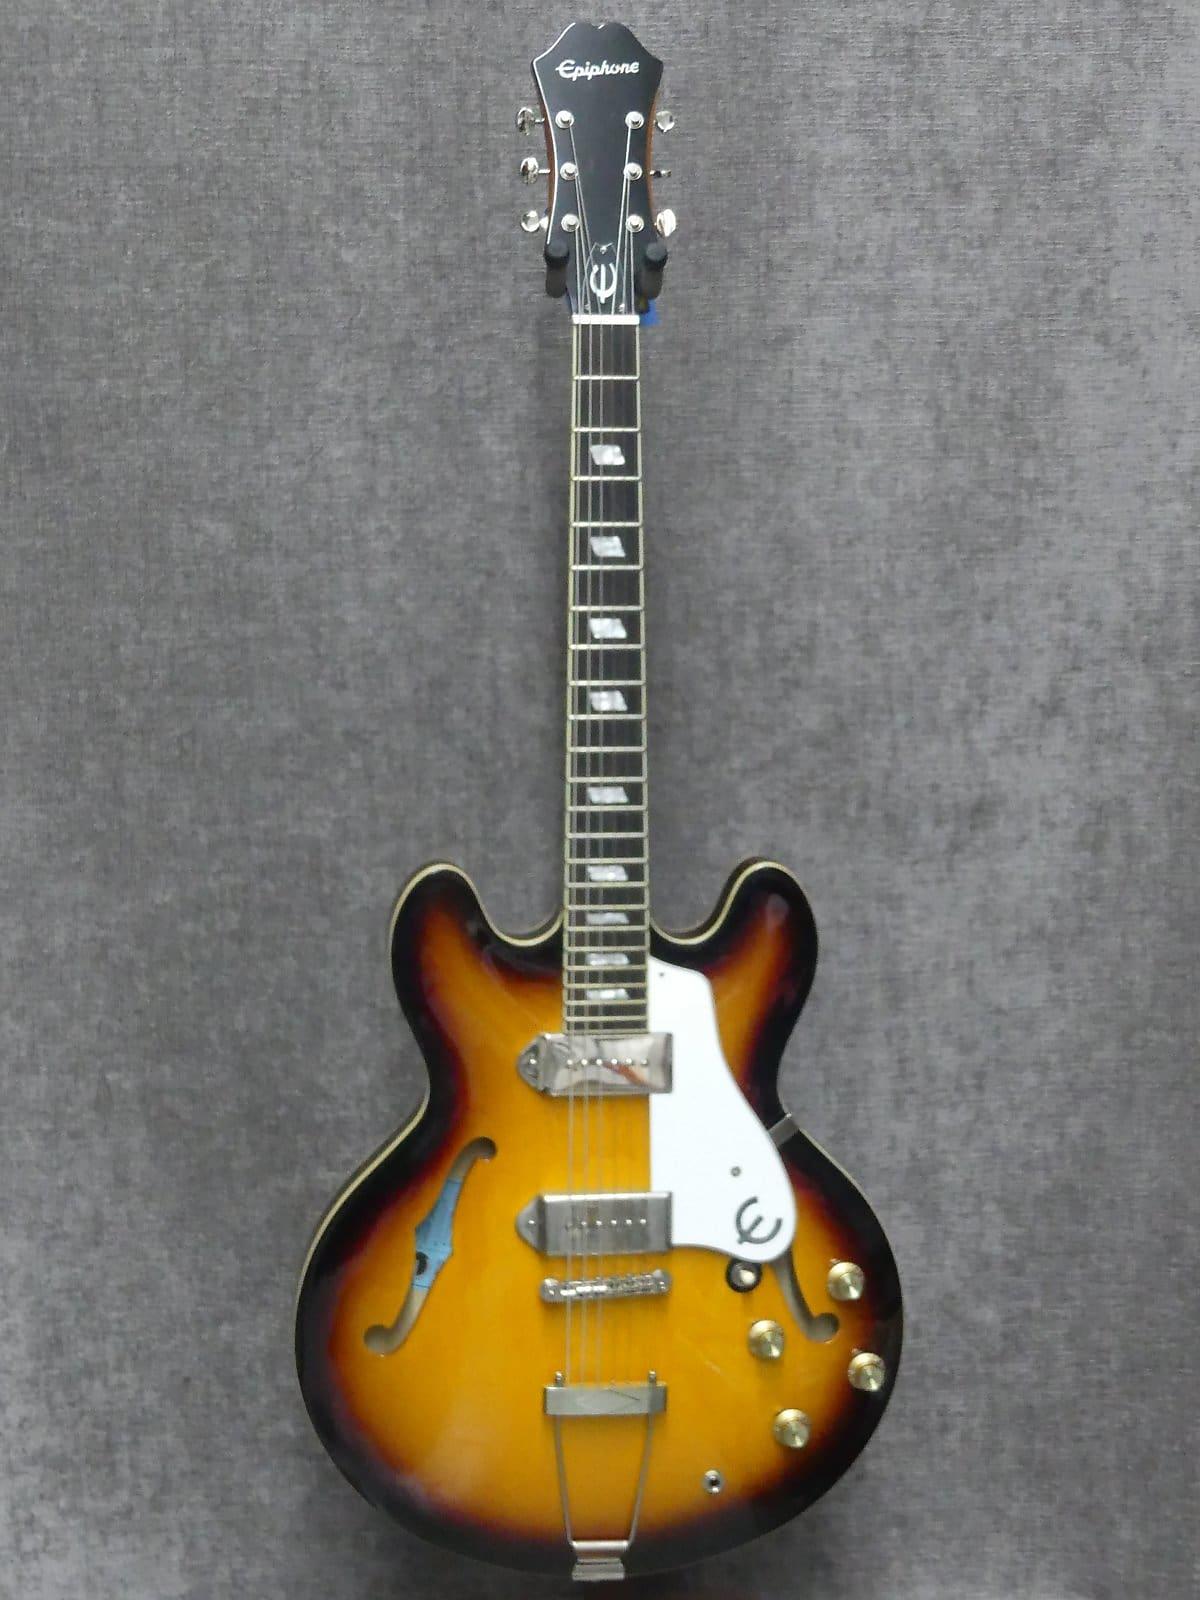 Epiphone E230td Inspired By John Lennon 1965 Casino Electric Guitar W Case